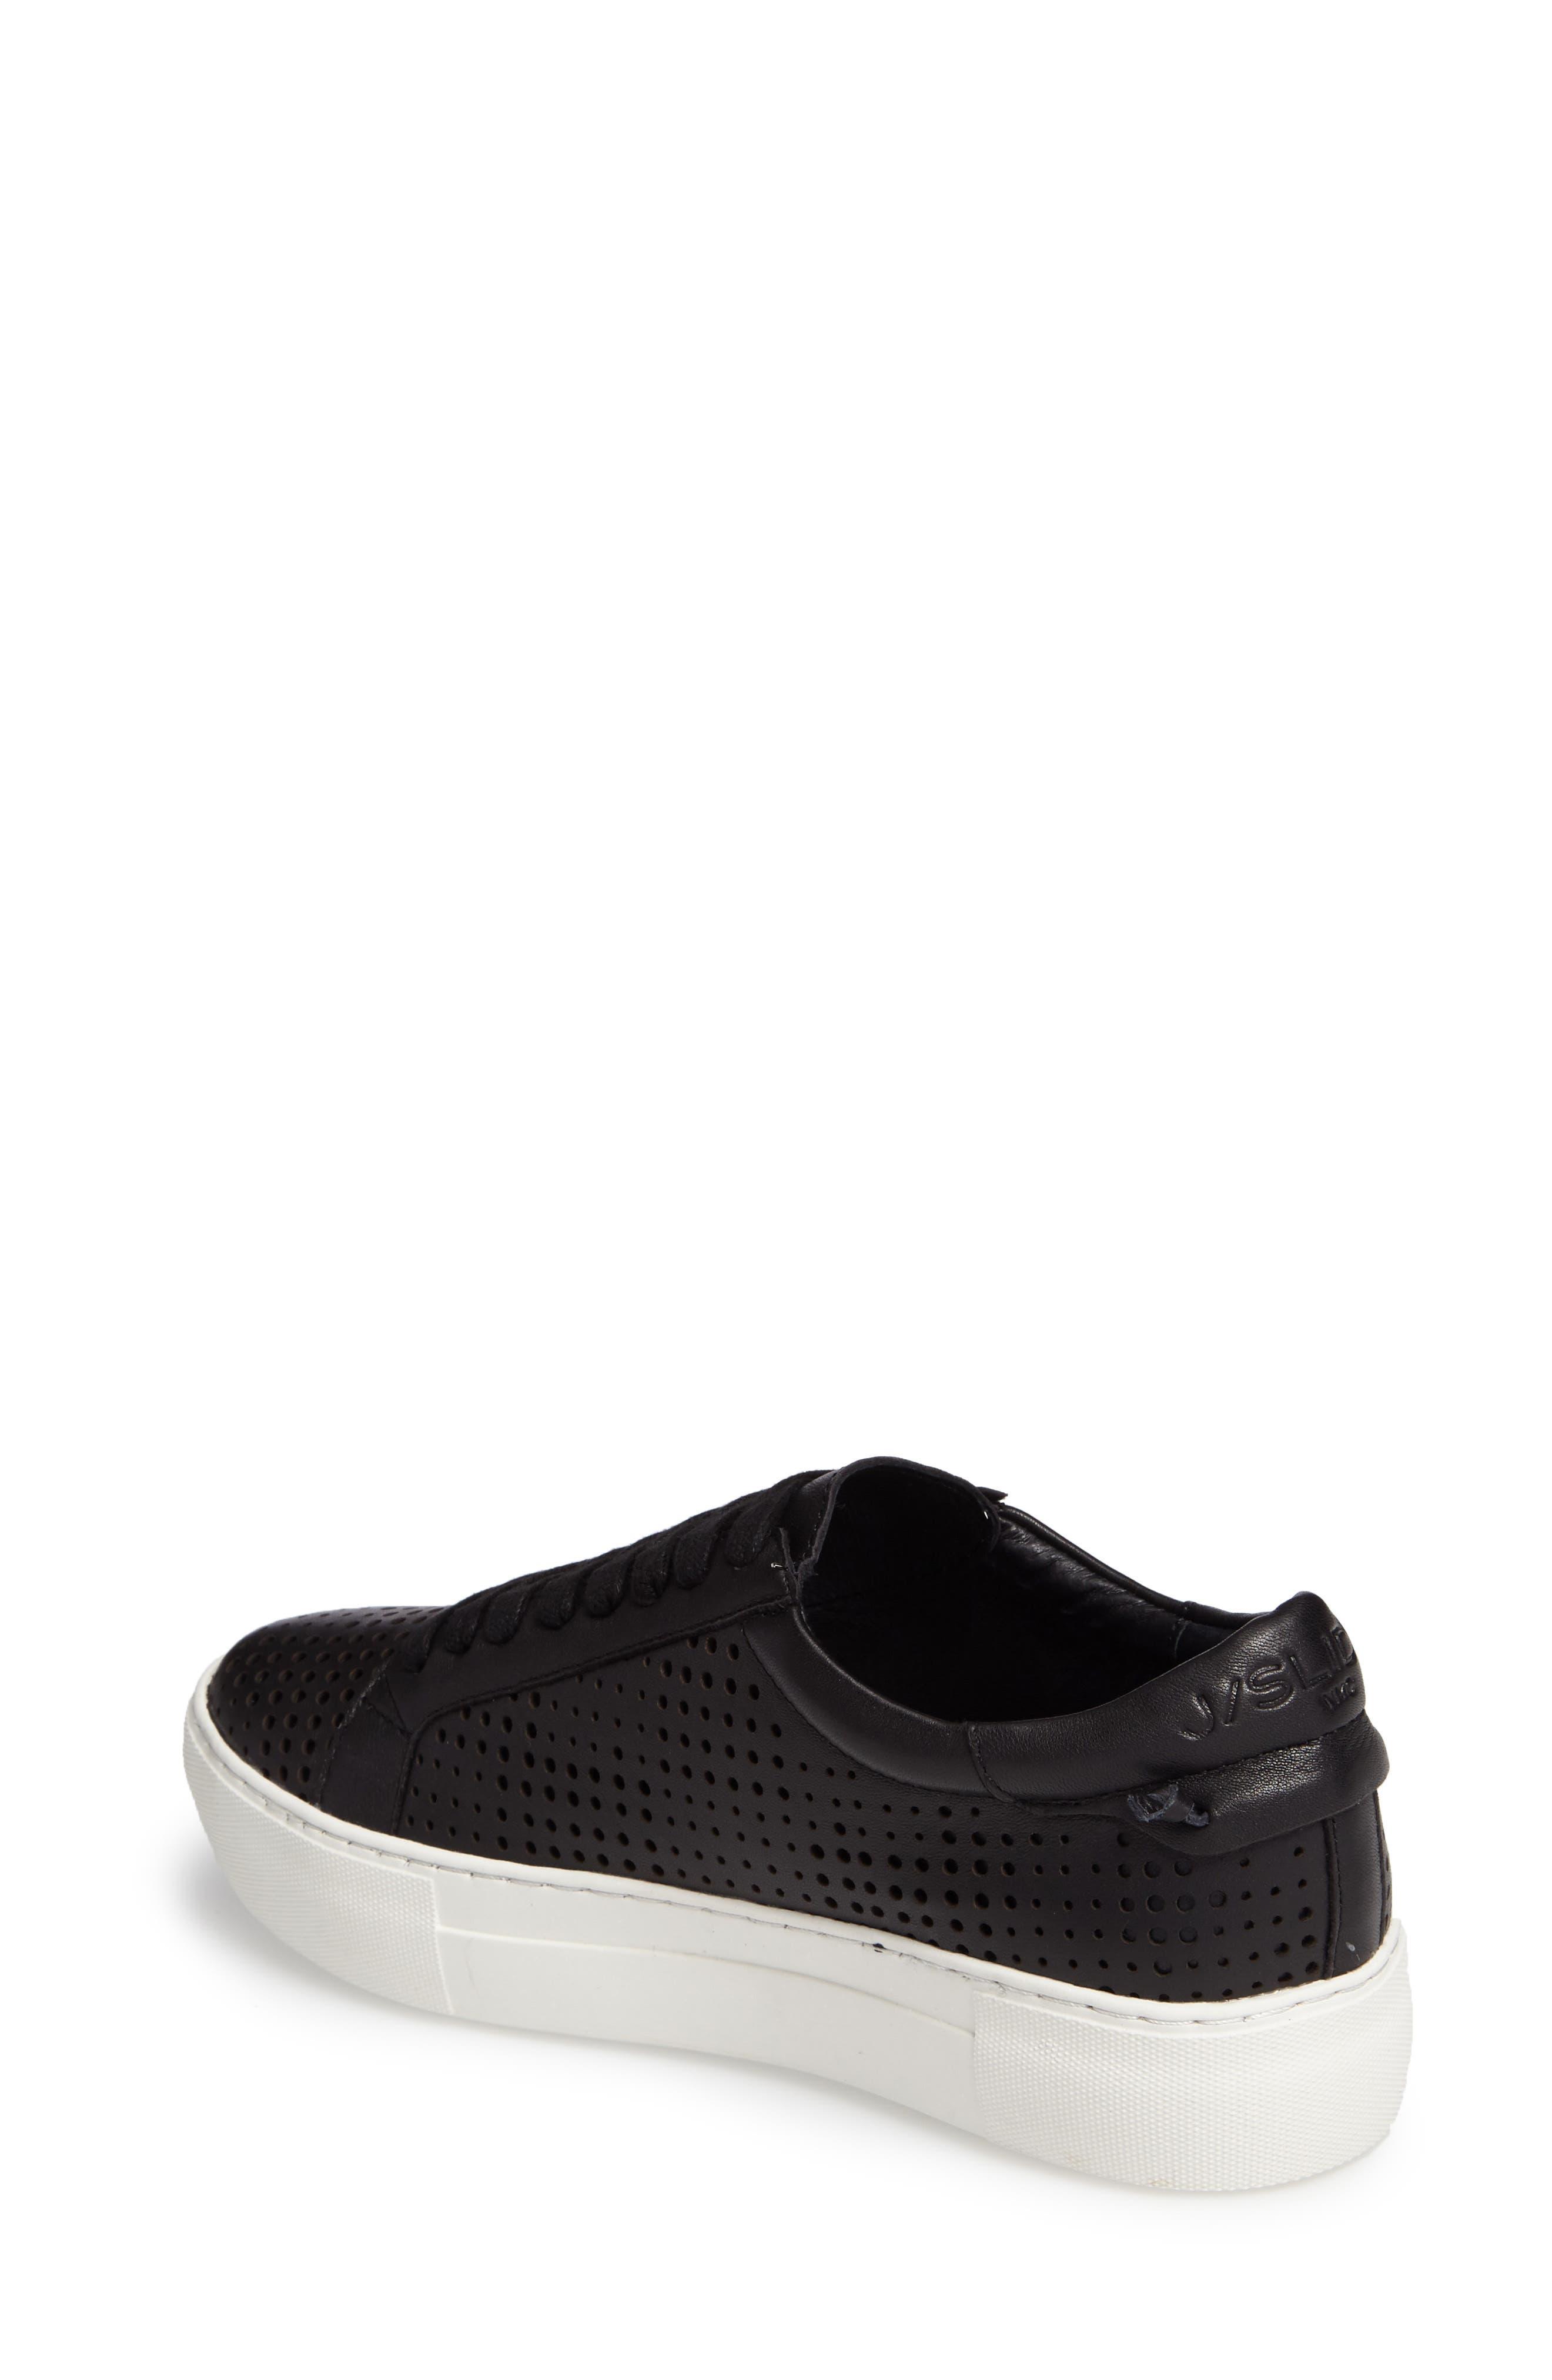 Audrina Platform Sneaker,                             Alternate thumbnail 2, color,                             015